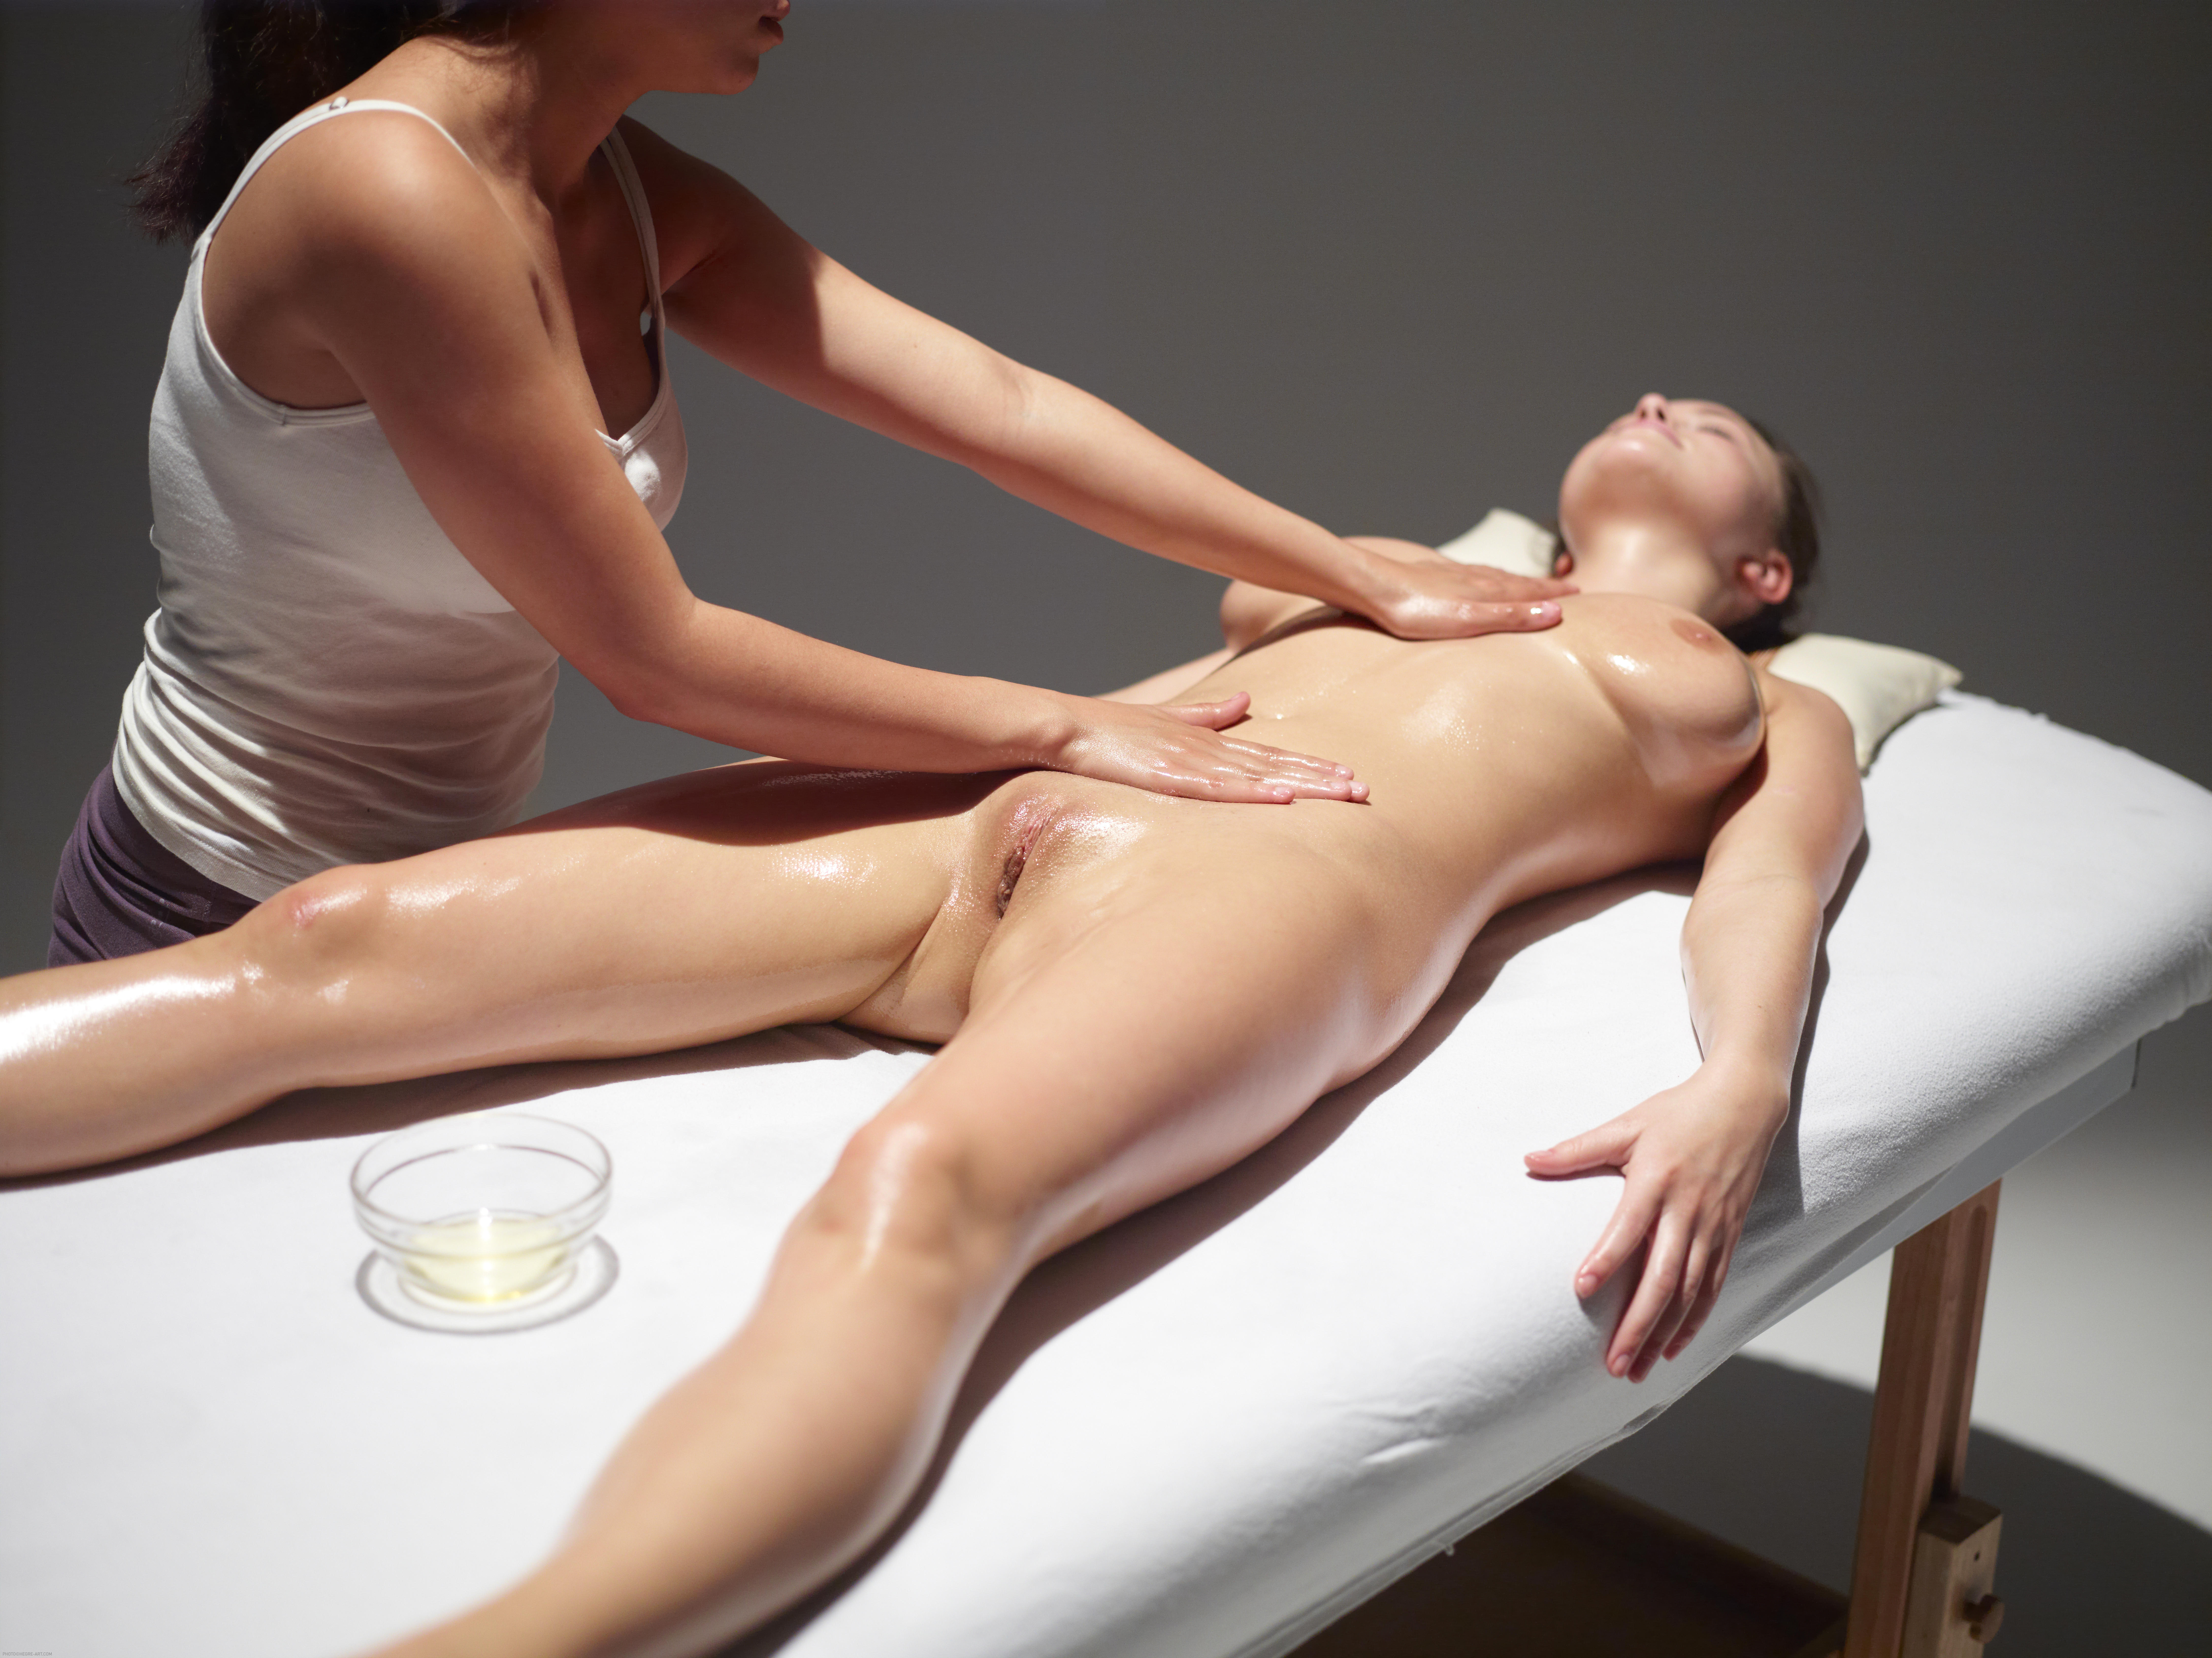 erotisk massage Sjælland eb massage com